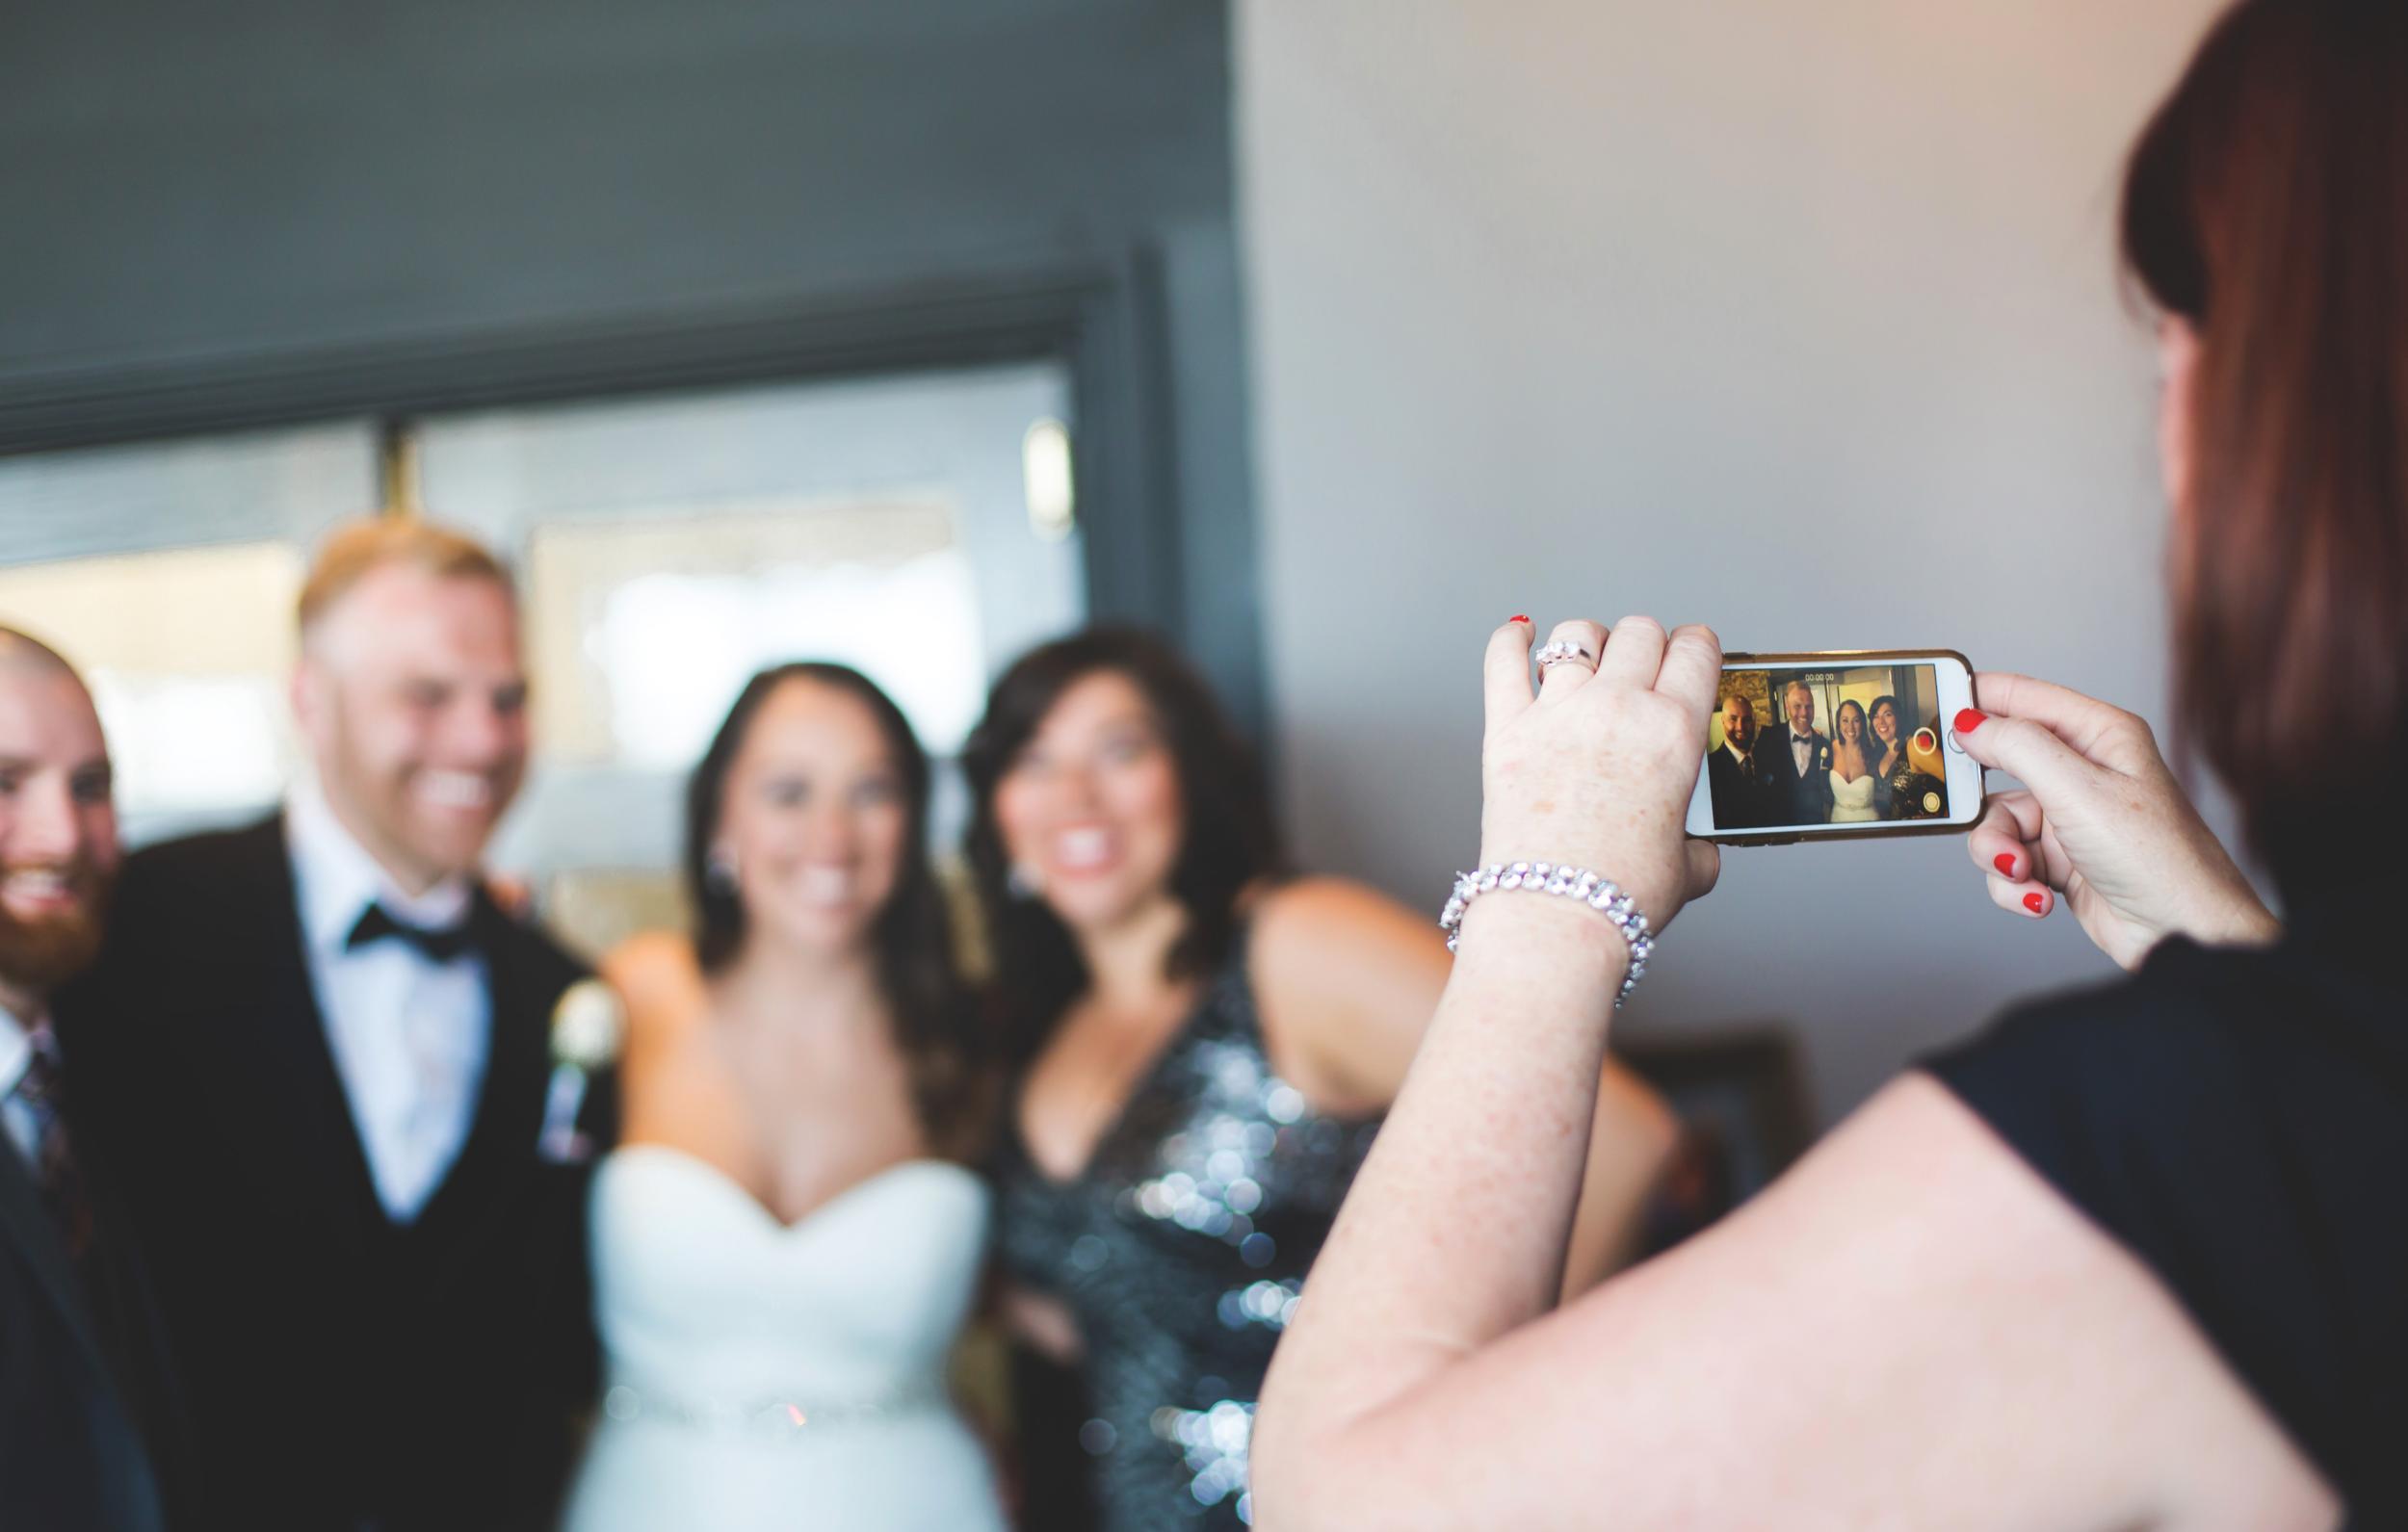 Wedding-Harbour-Banquet-Center-Oakville-Photographer-Wedding-Hamilton-Saint-James-Espresso-Downtown-HamOnt-GTA-Niagara-Toronto-Moments-by-Lauren-Photography-Photo-Image-51.png